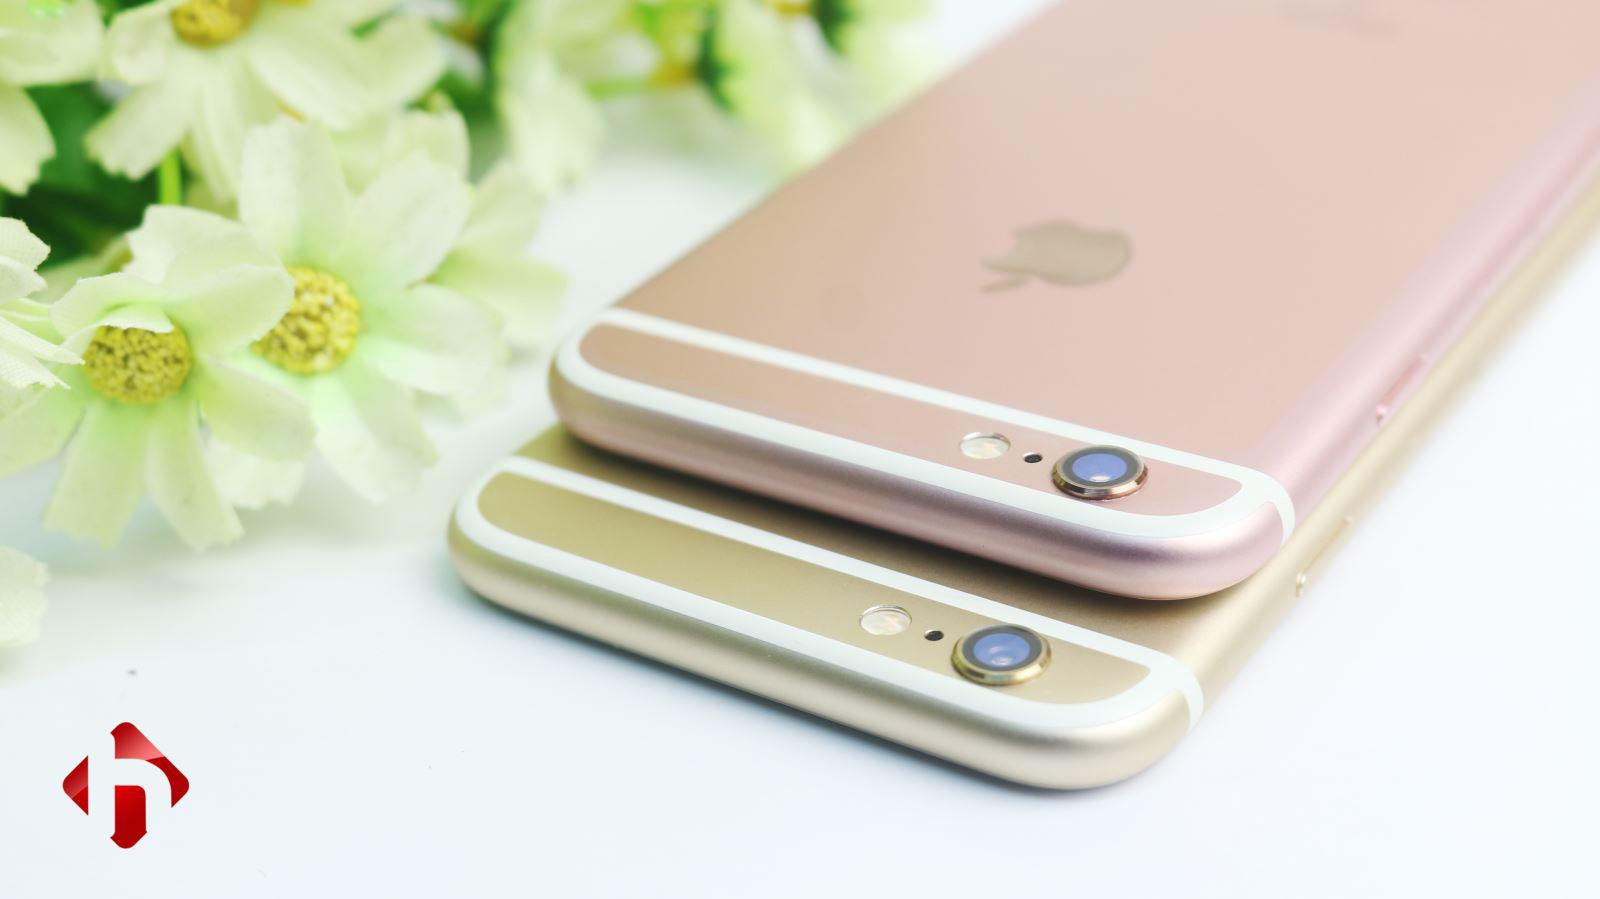 Camera trên iPhone 6 và 6s